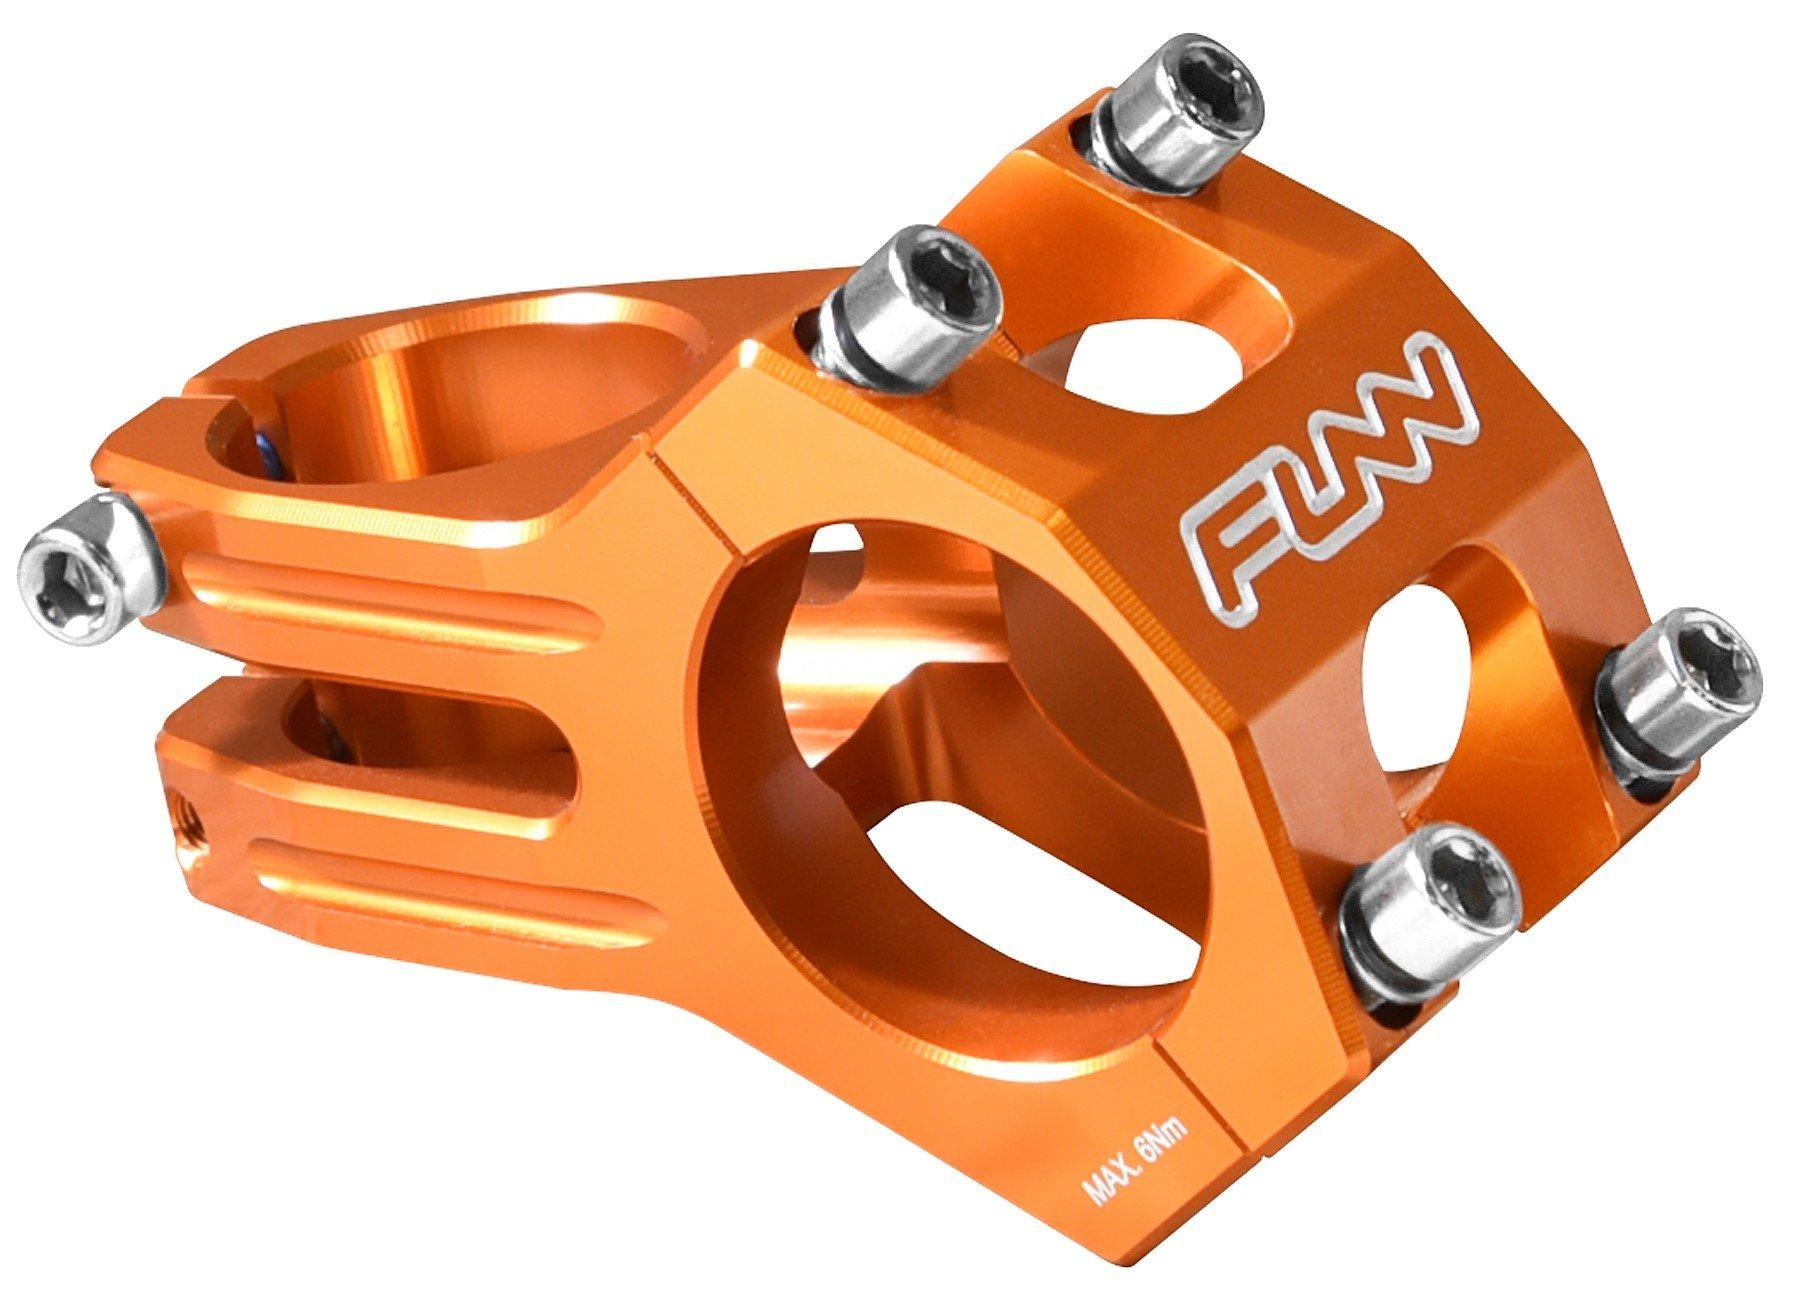 Funn Funnduro MTB Stem, Bar Clamp 31.8mm (Length 60mm, Orange) by Funn